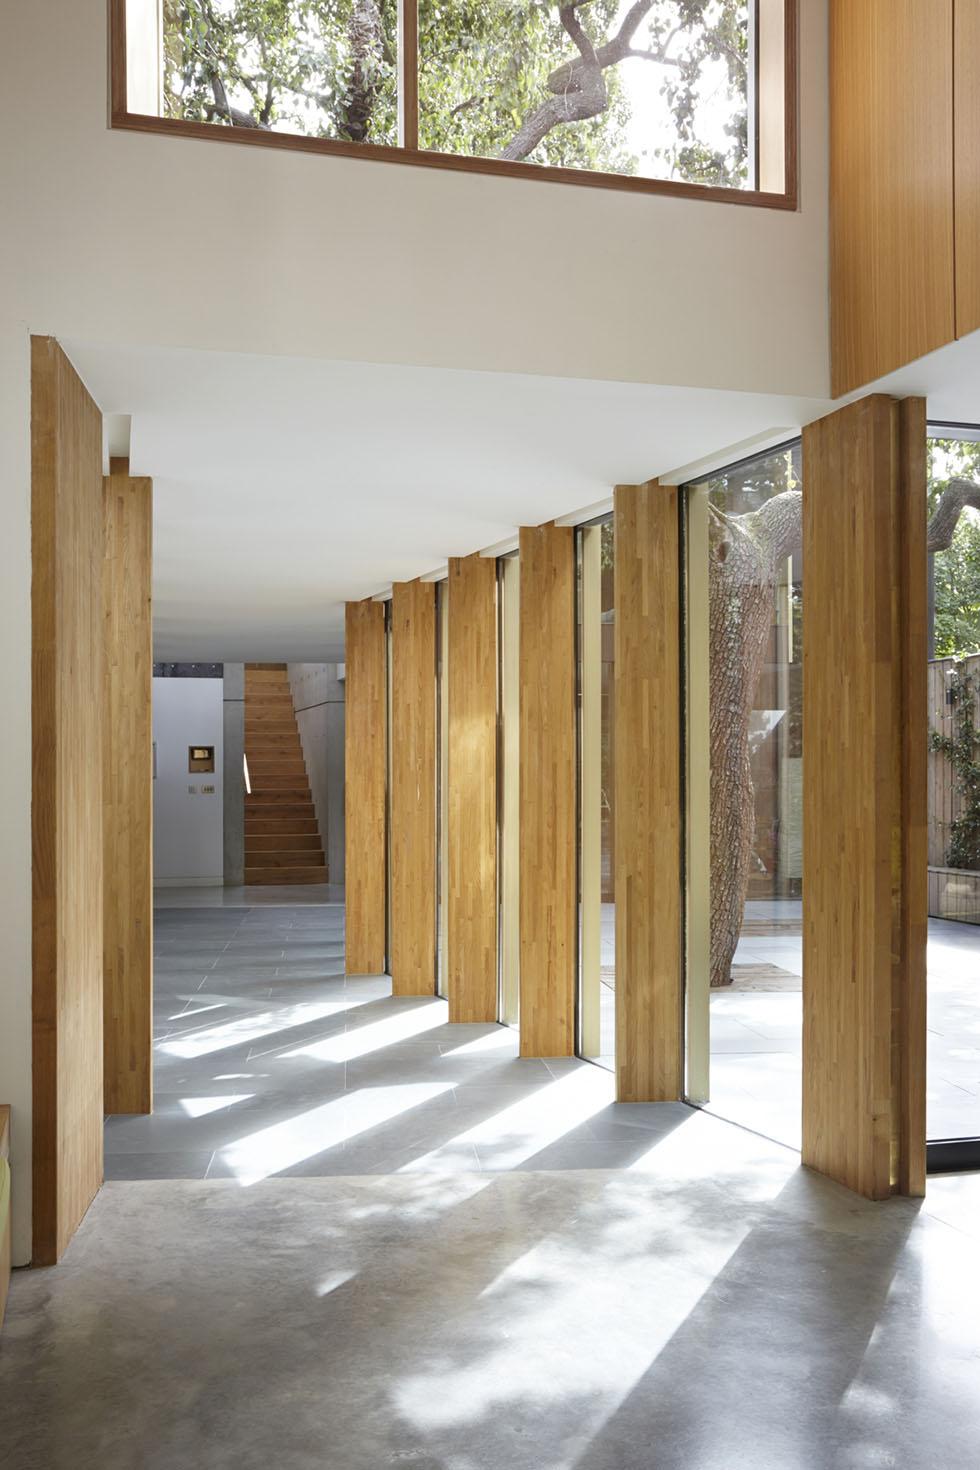 glass corridor with wooden vertical beams